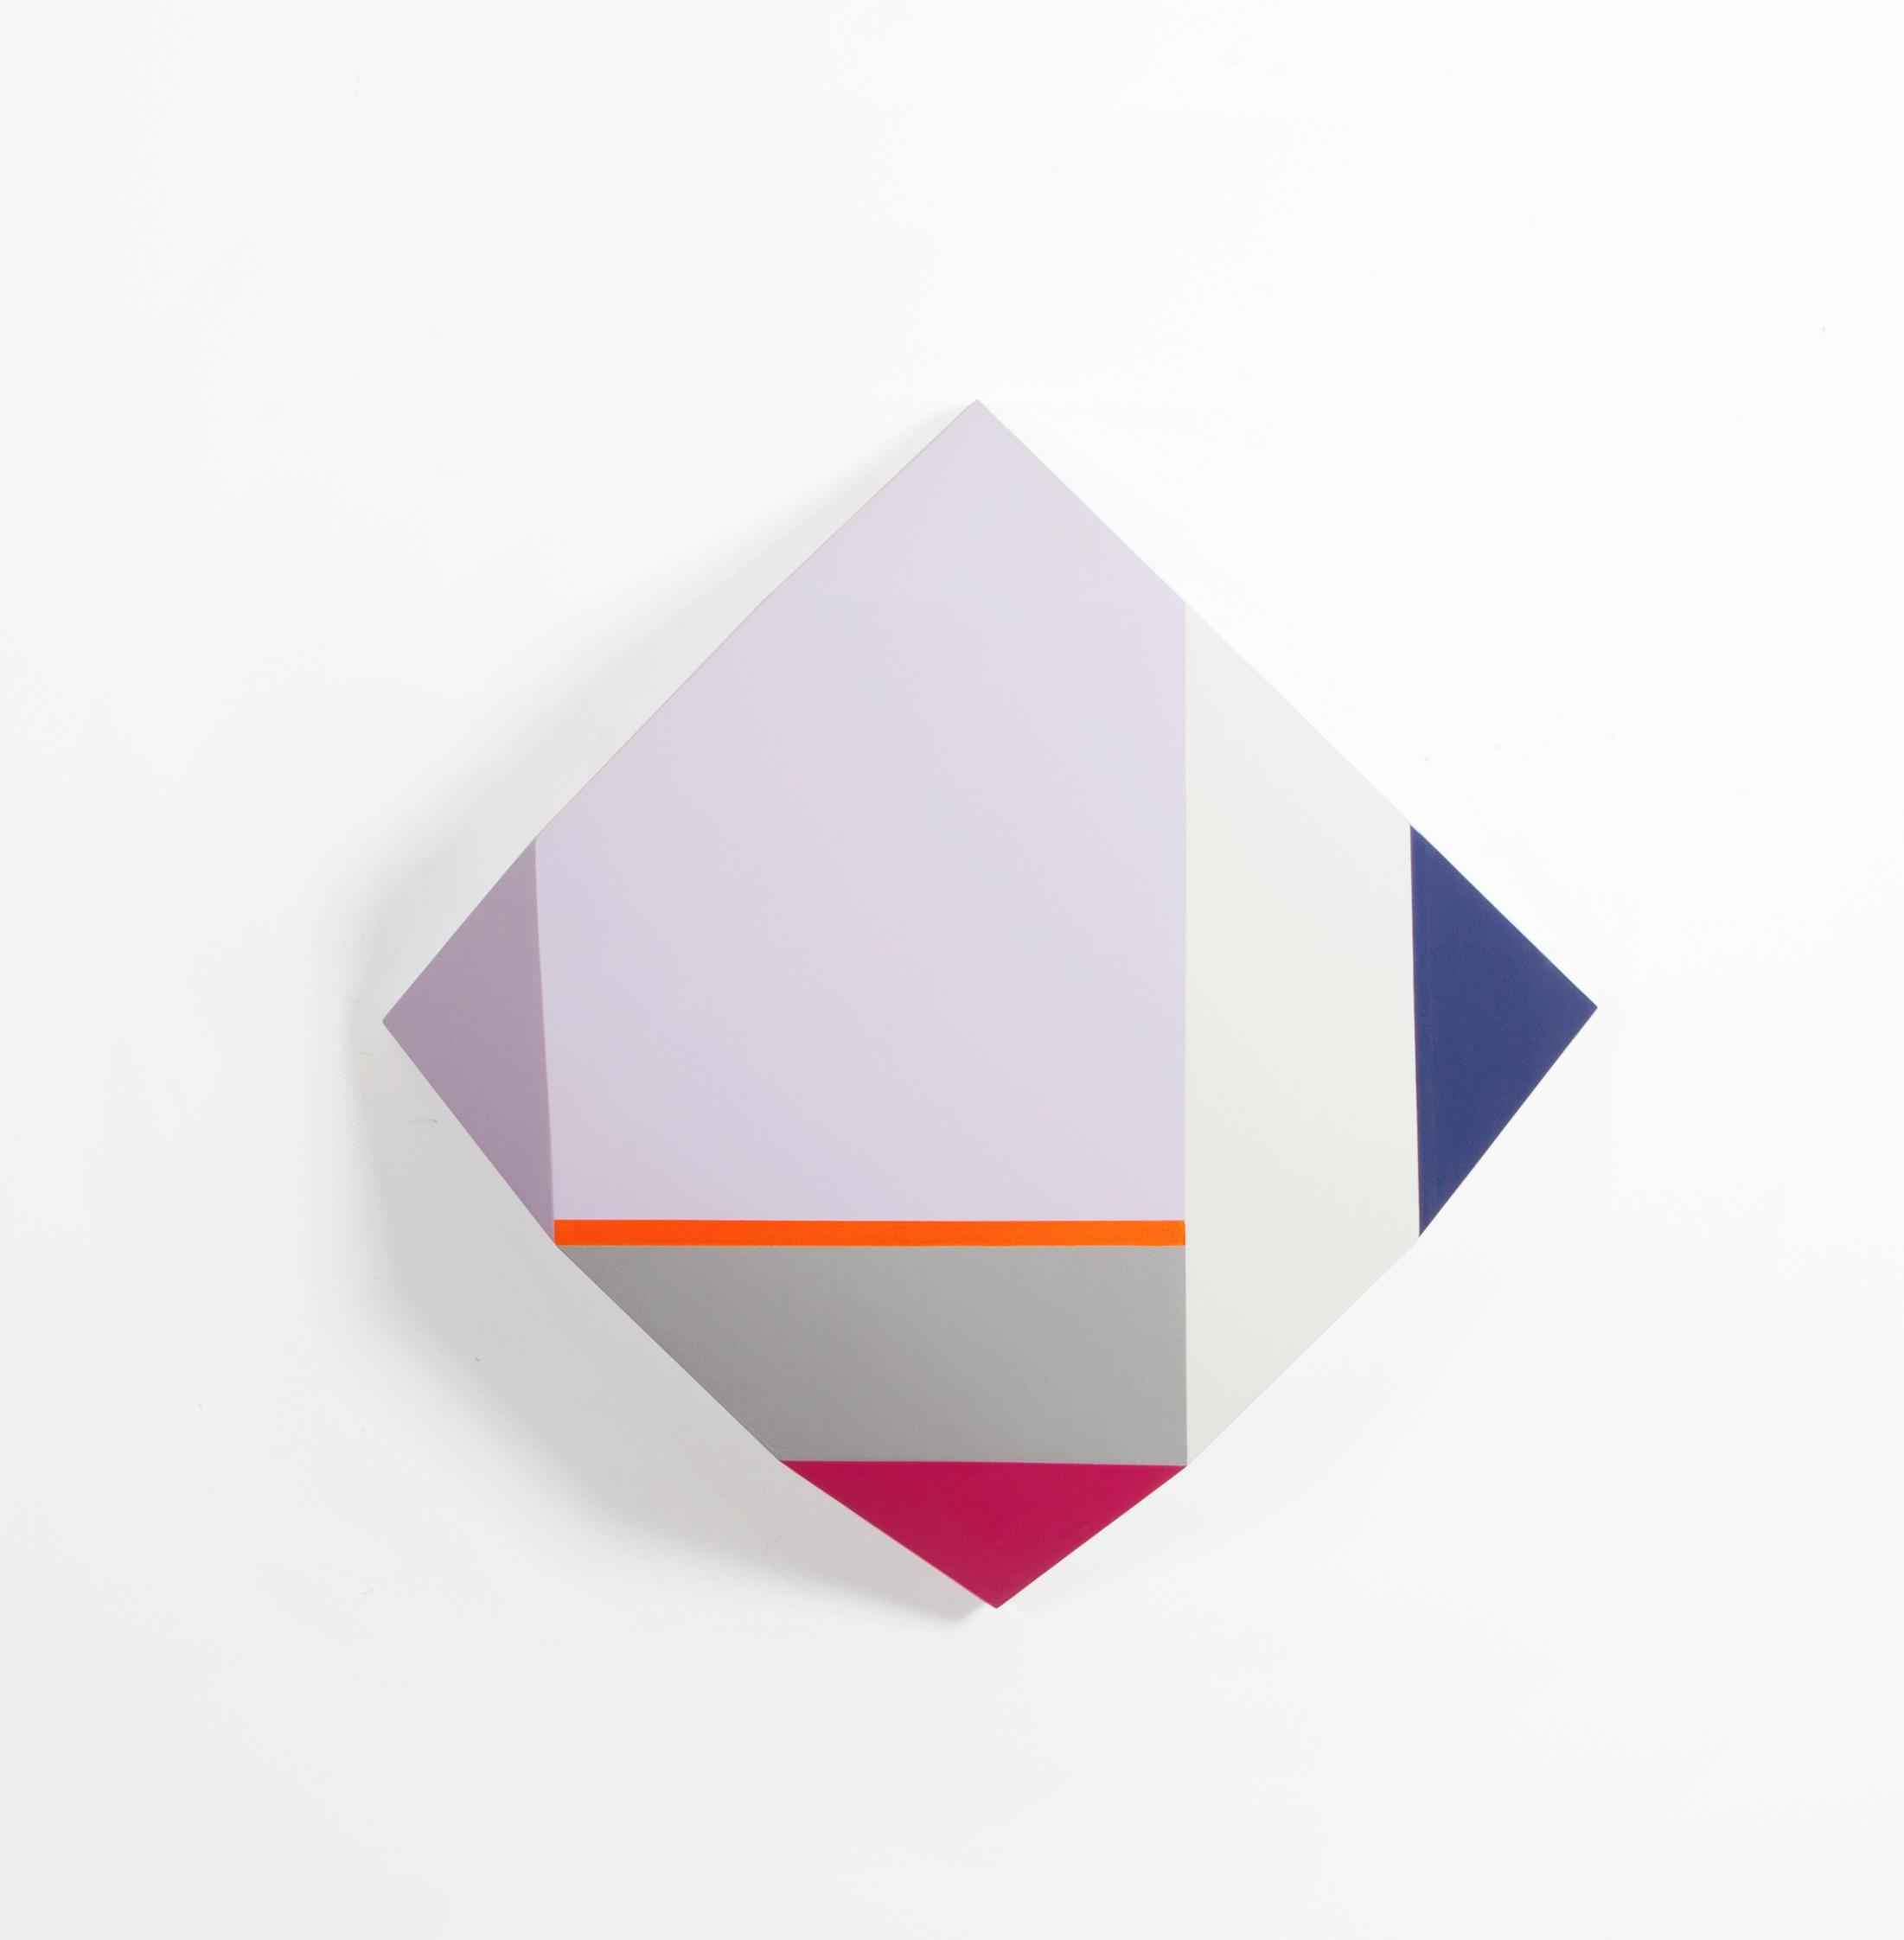 Zin Helena Song   Origami 1 #38   2015   Mixed Media on Wood   28 x 28 x 6 in.